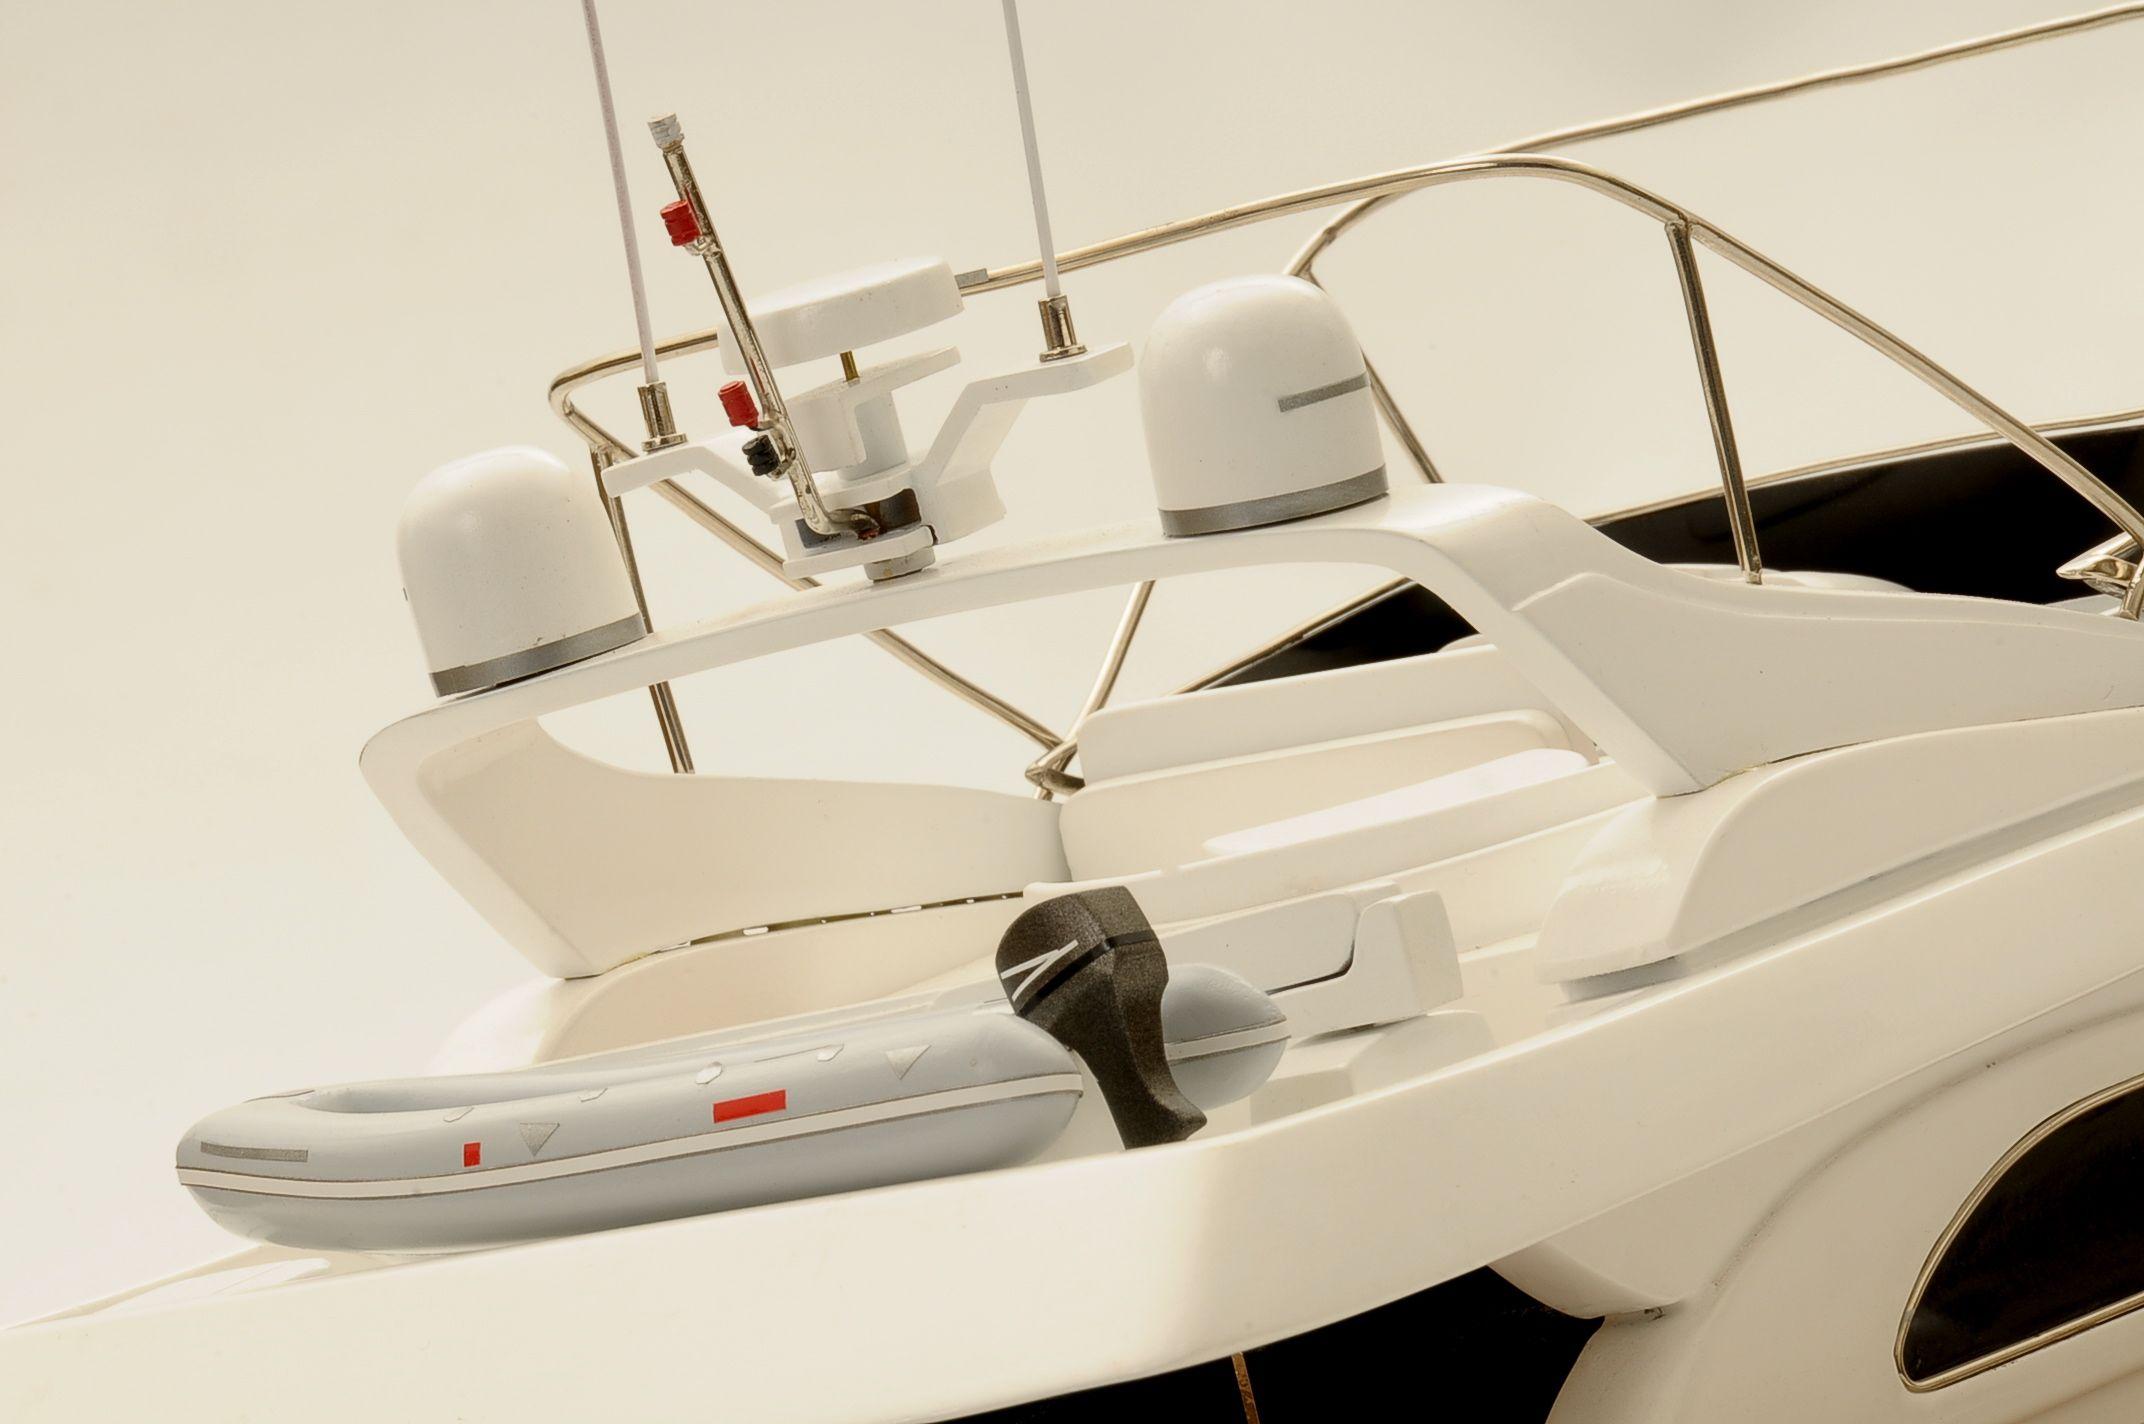 1236-6358-Astondoa-72-GLX-Motor-Yacht-Premier-Range